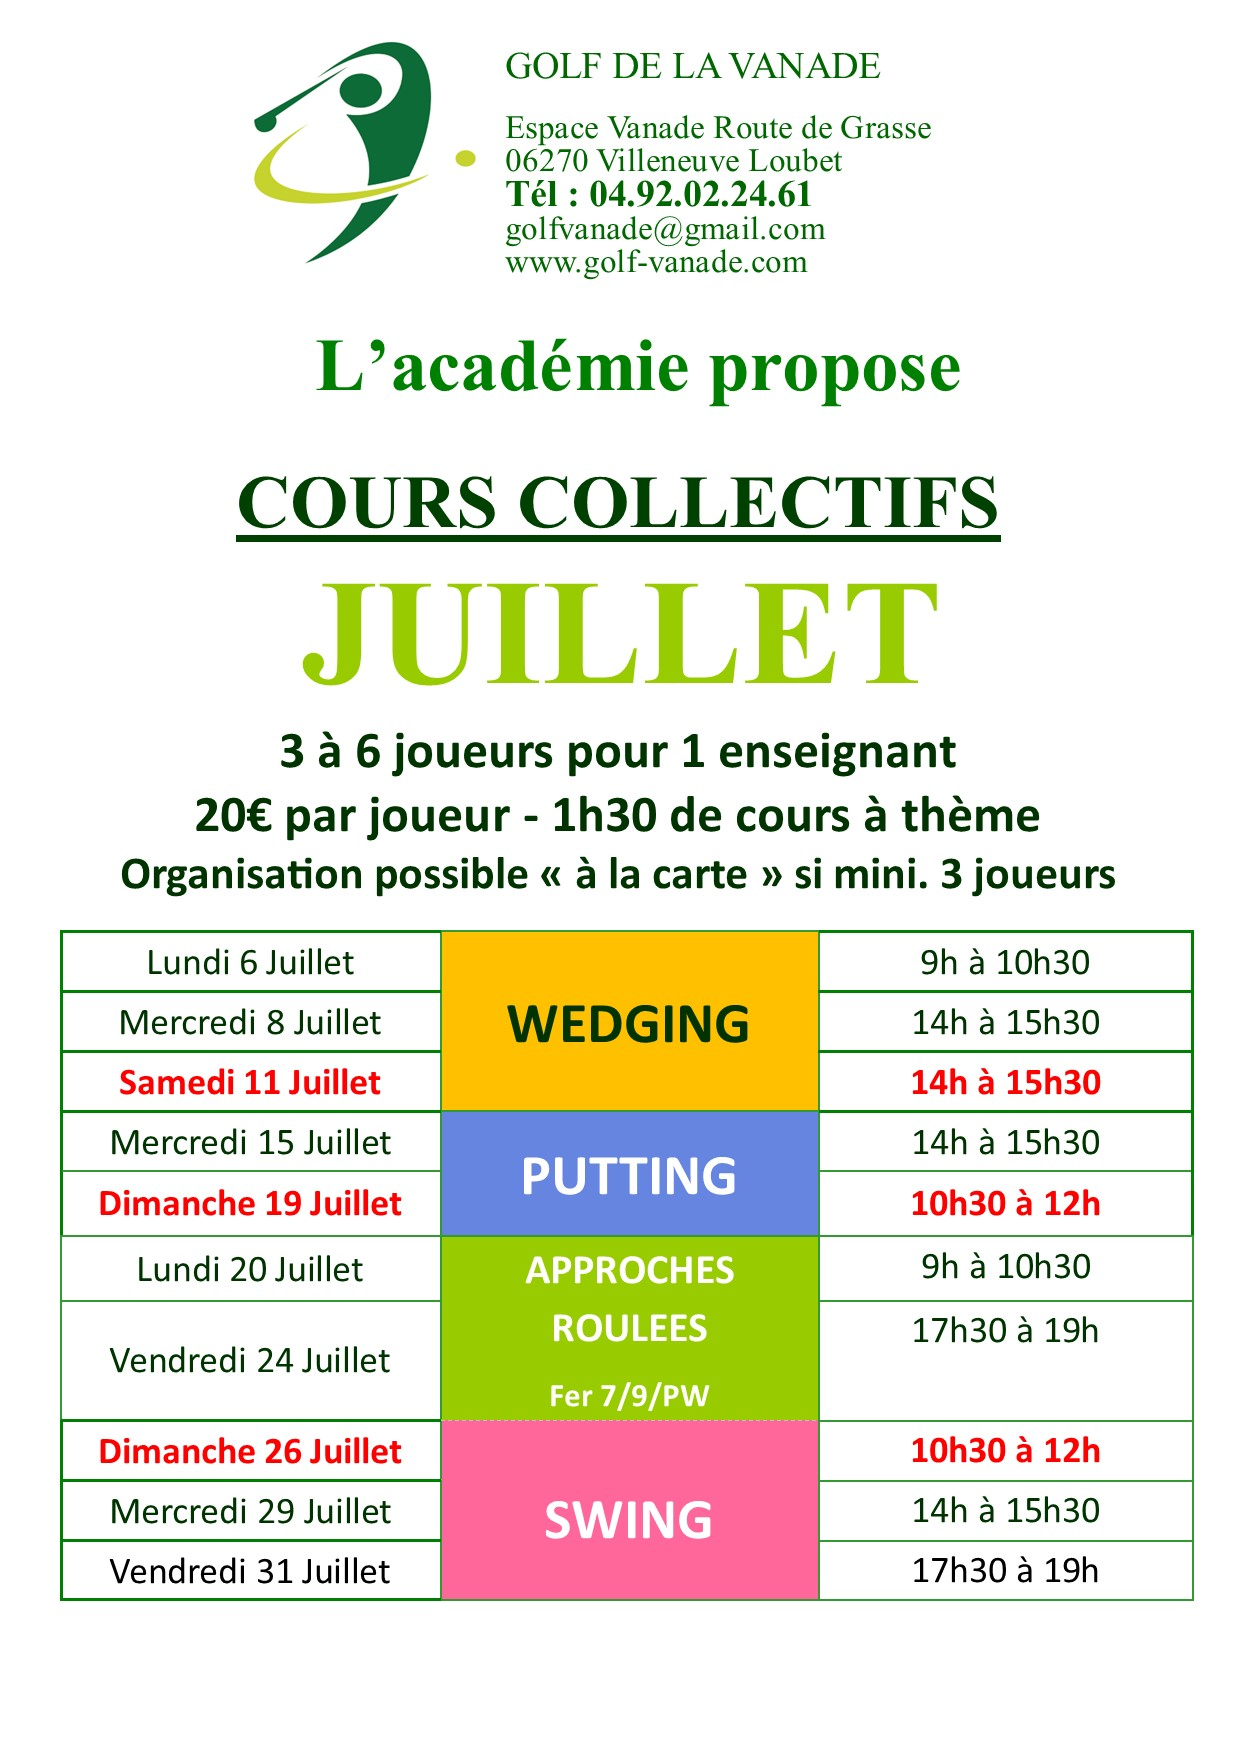 Cours collectifs Juillet 2020